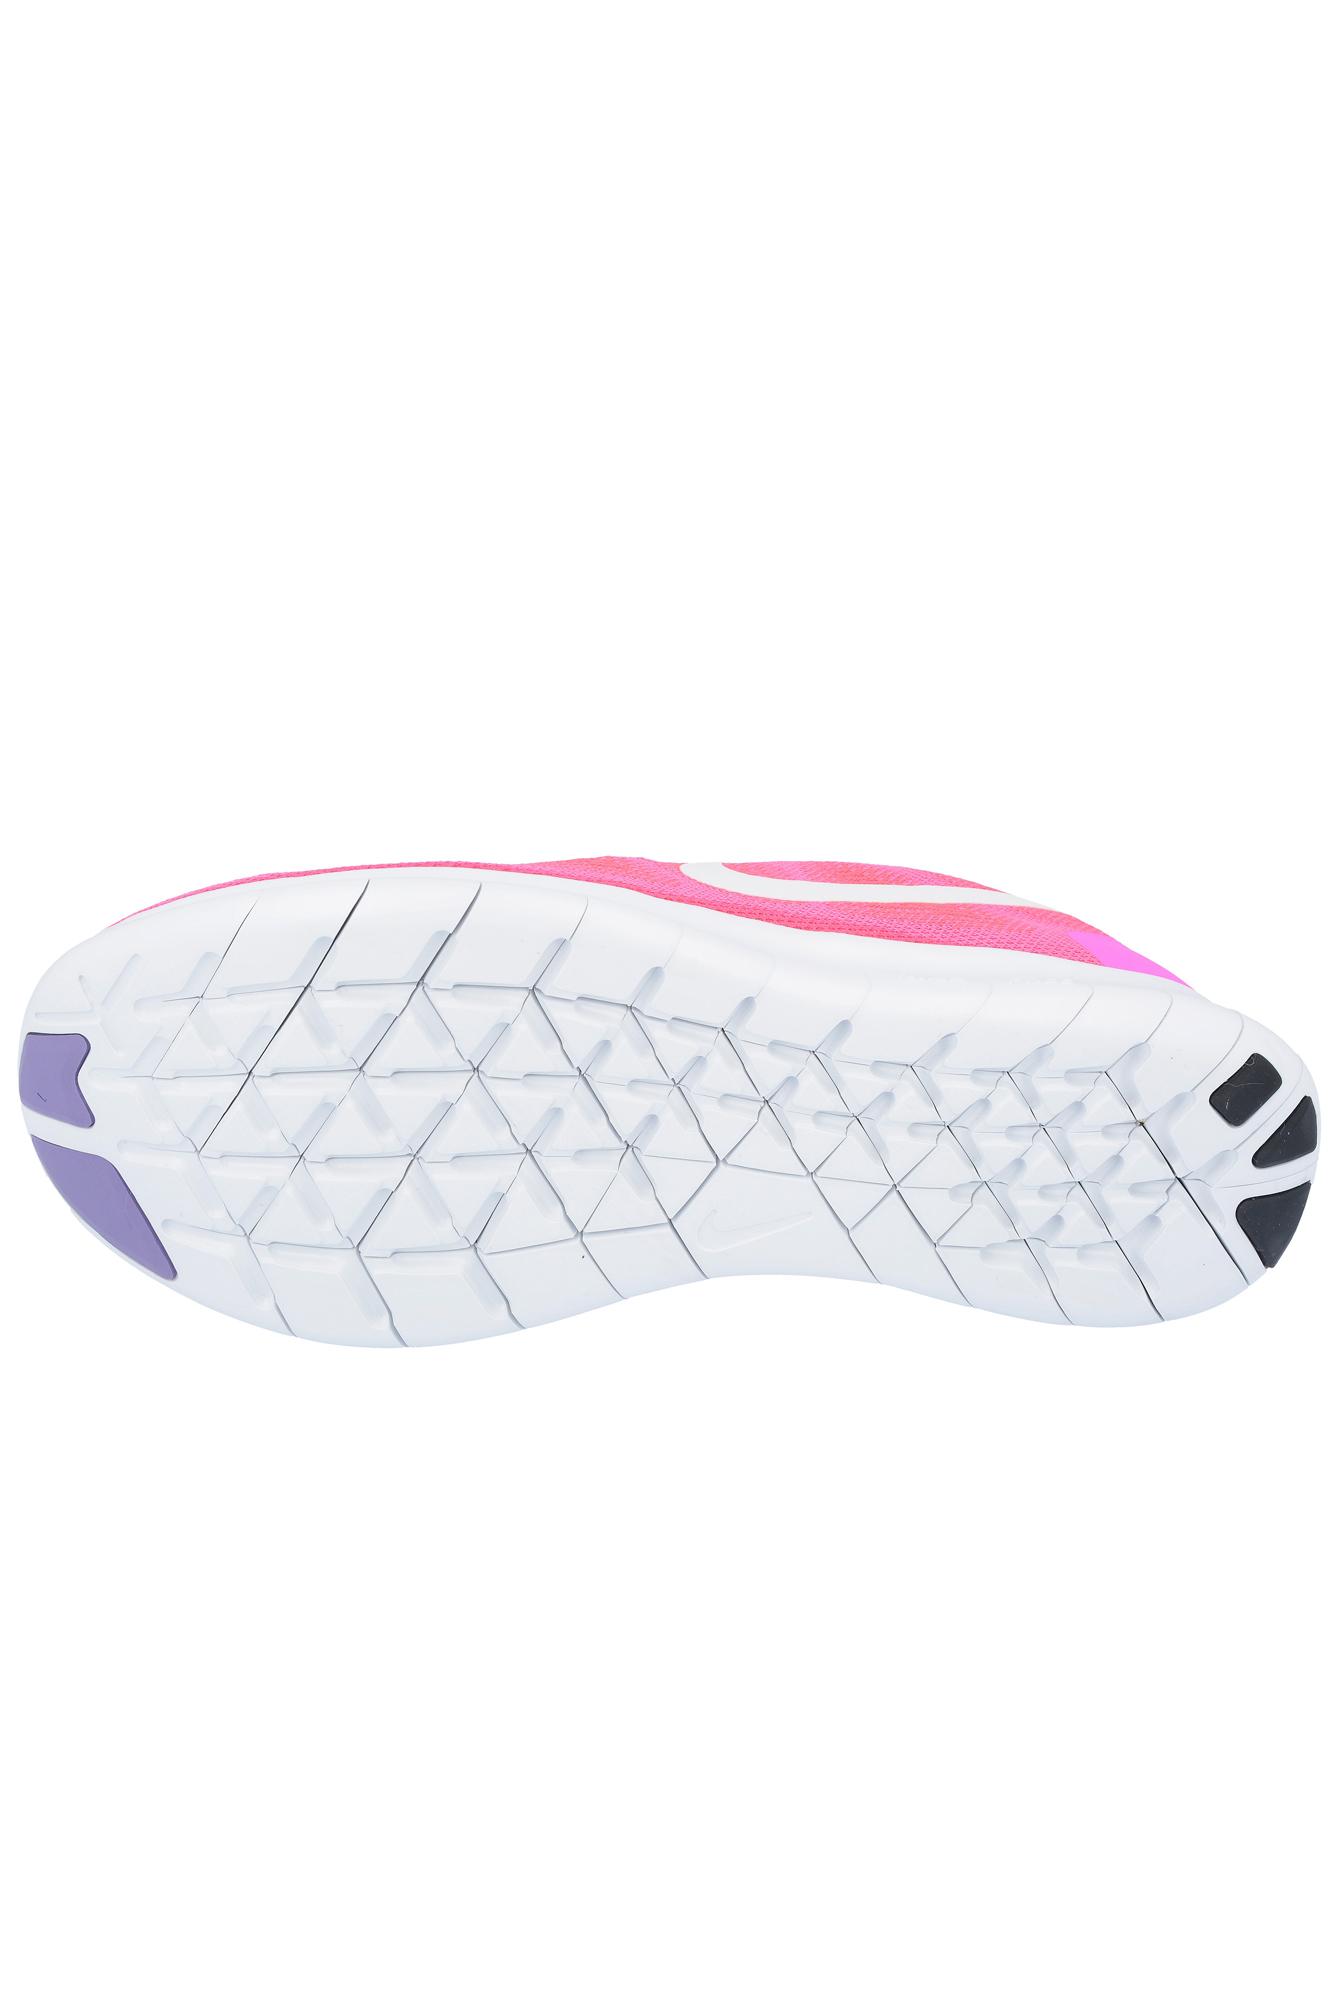 Buty Nike Free RN 2017 880840 601 UrbanGames